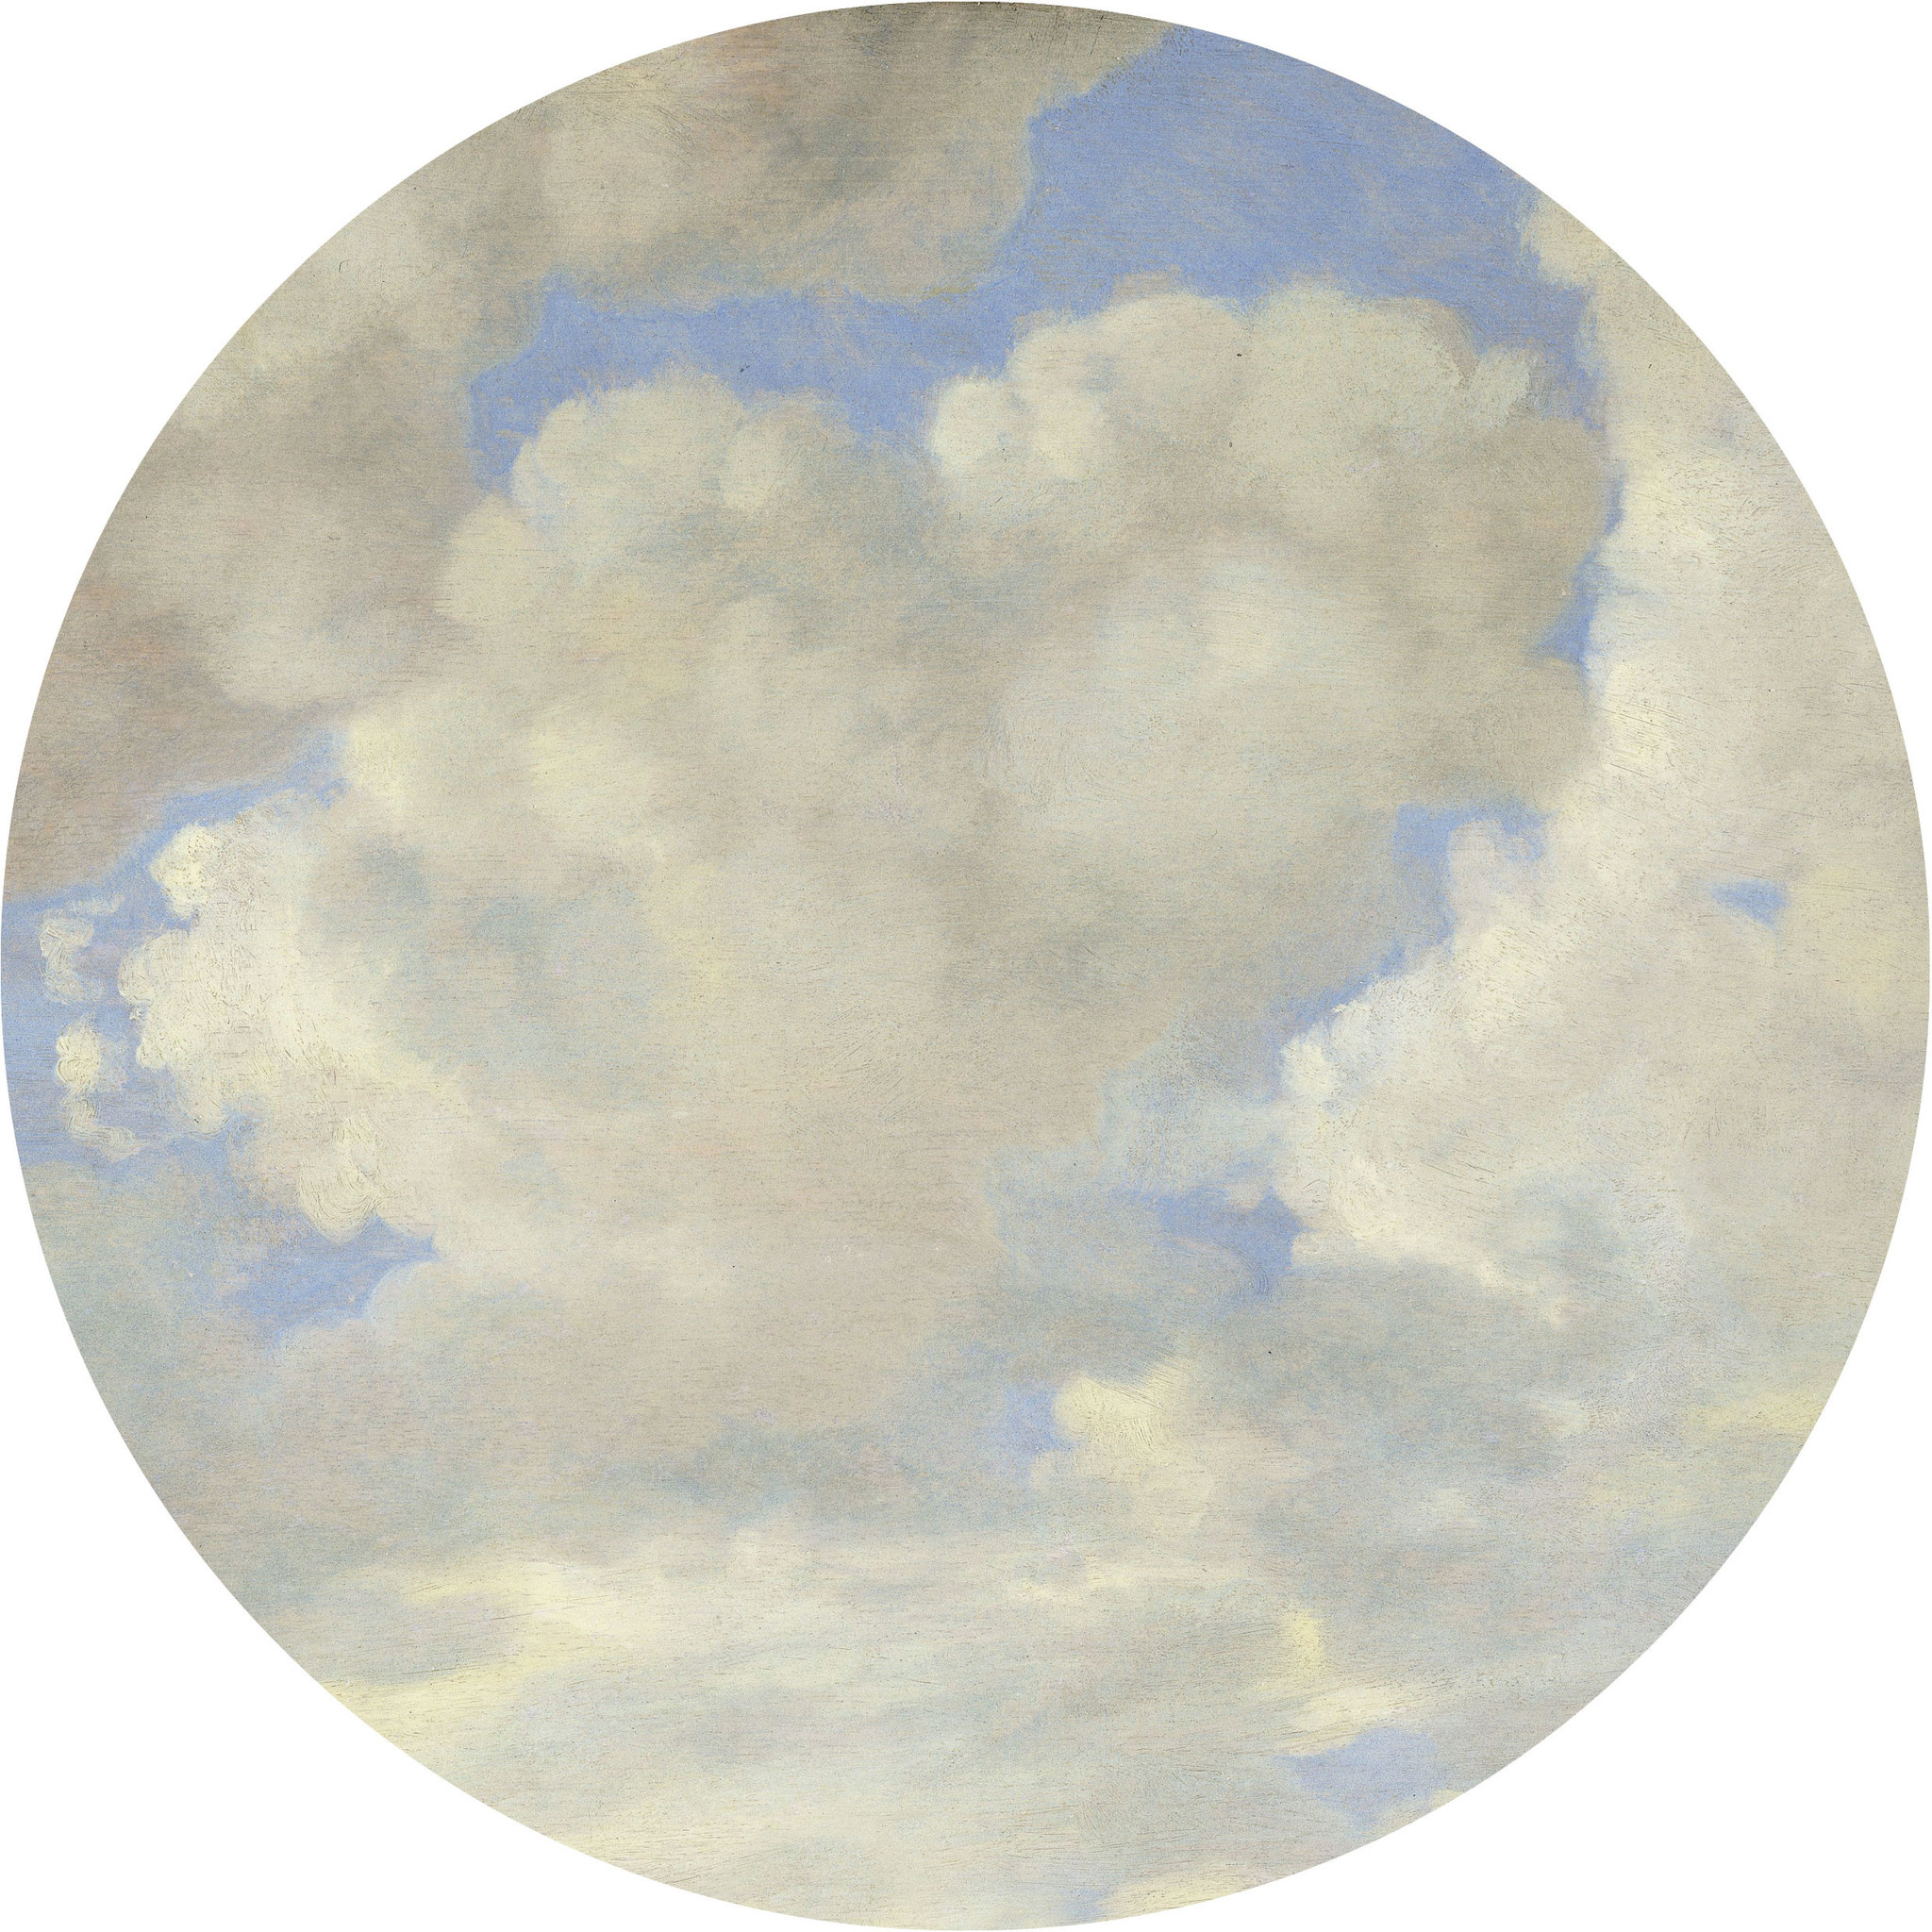 Behang Golden age clouds XL Round Ø237.5cm-1